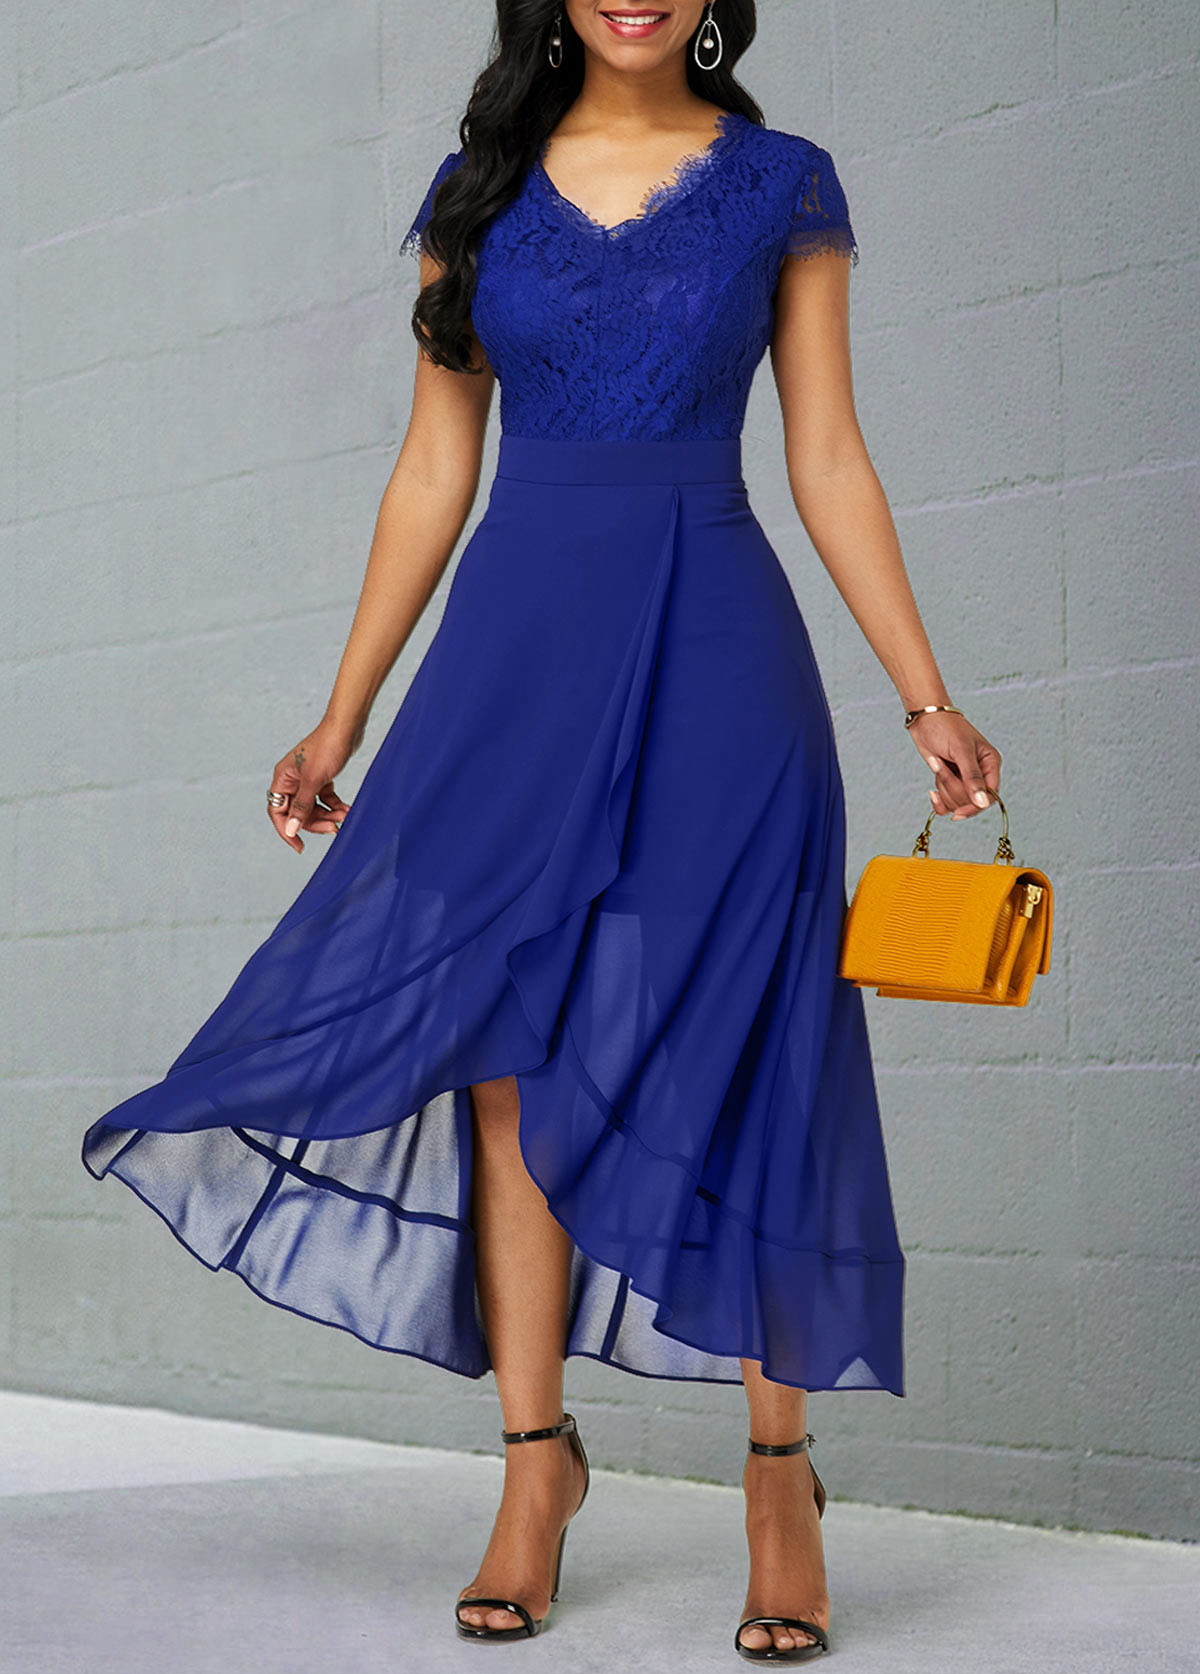 Lace Patchwork Chiffon Short Sleeve Dress